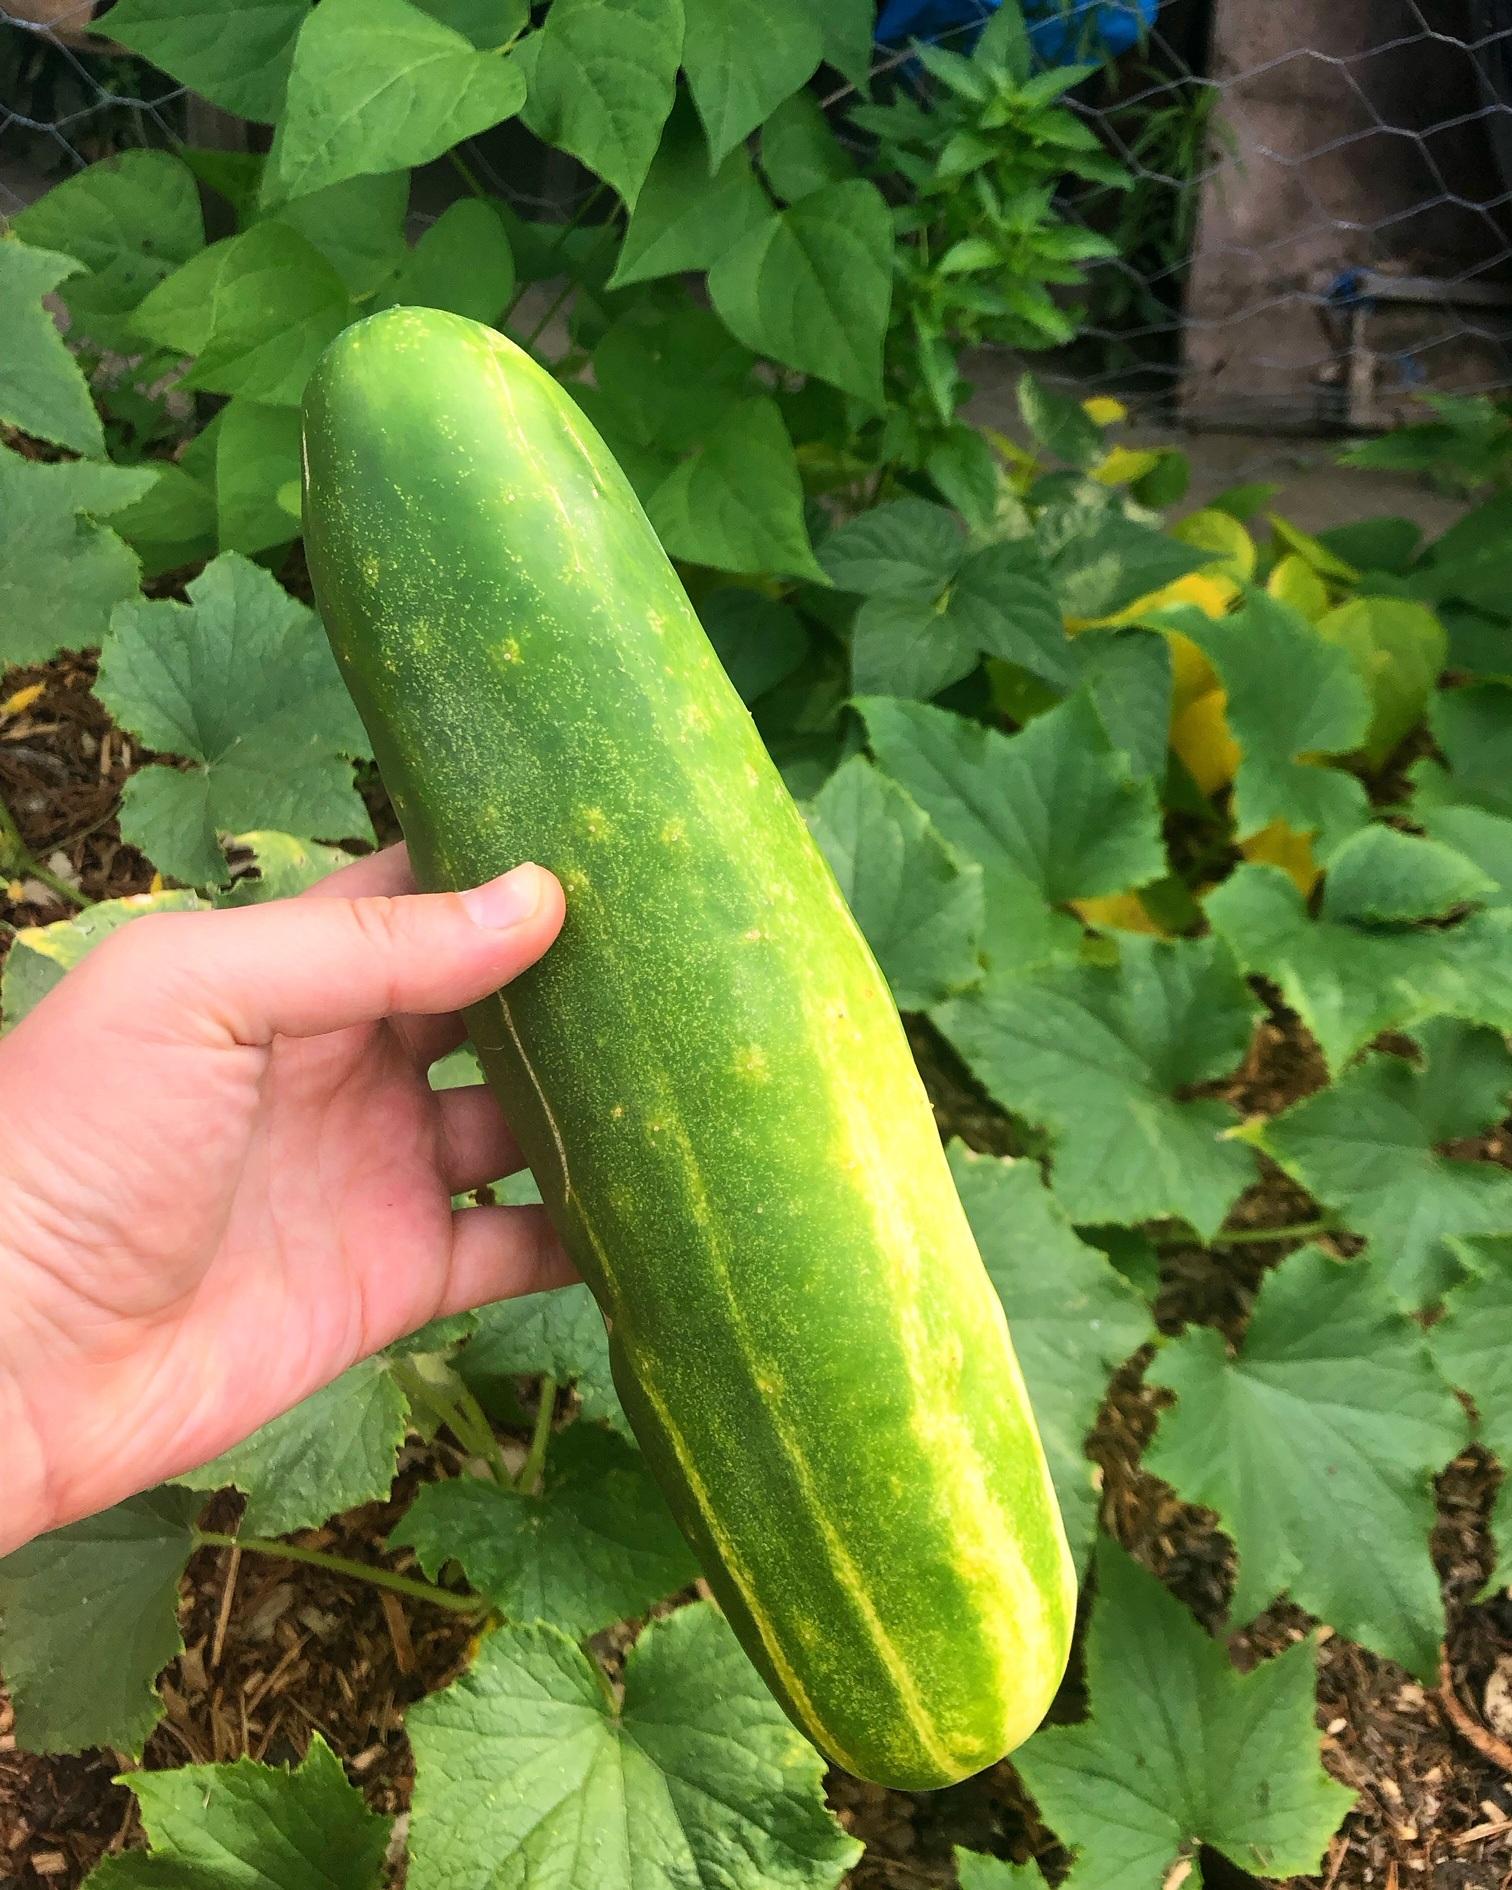 Humungous cucumbers!